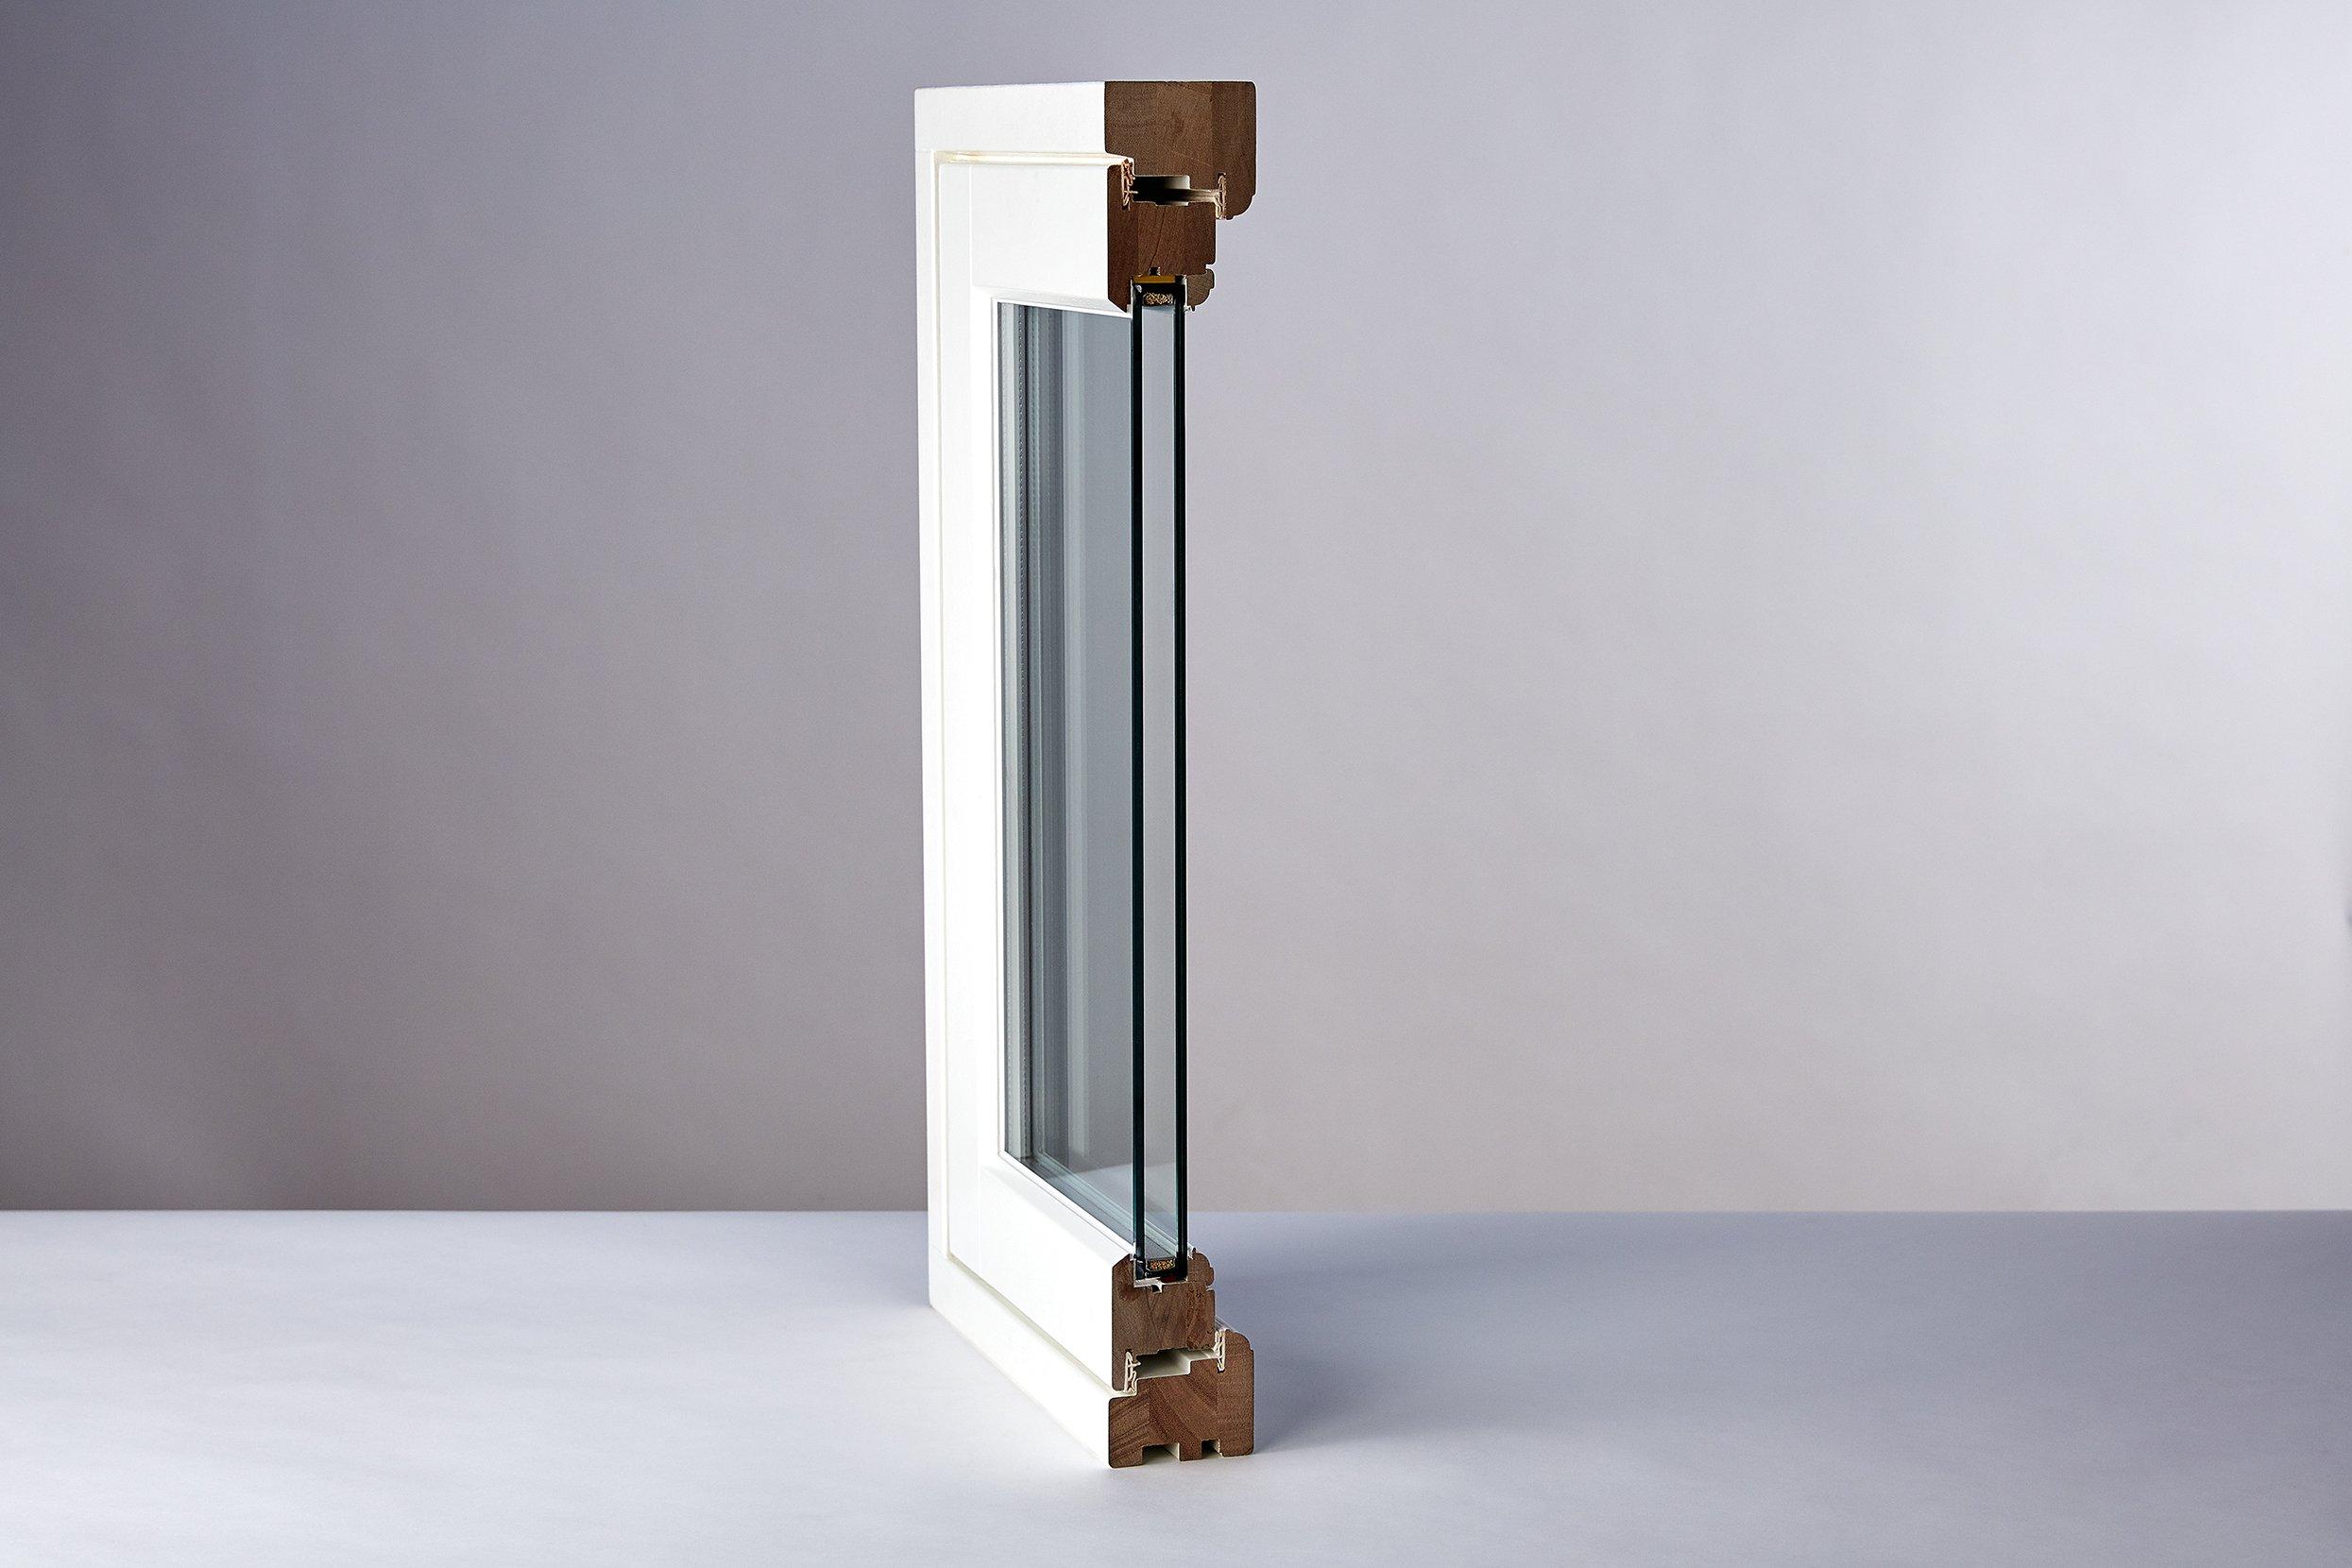 soundproof Sash Windows side